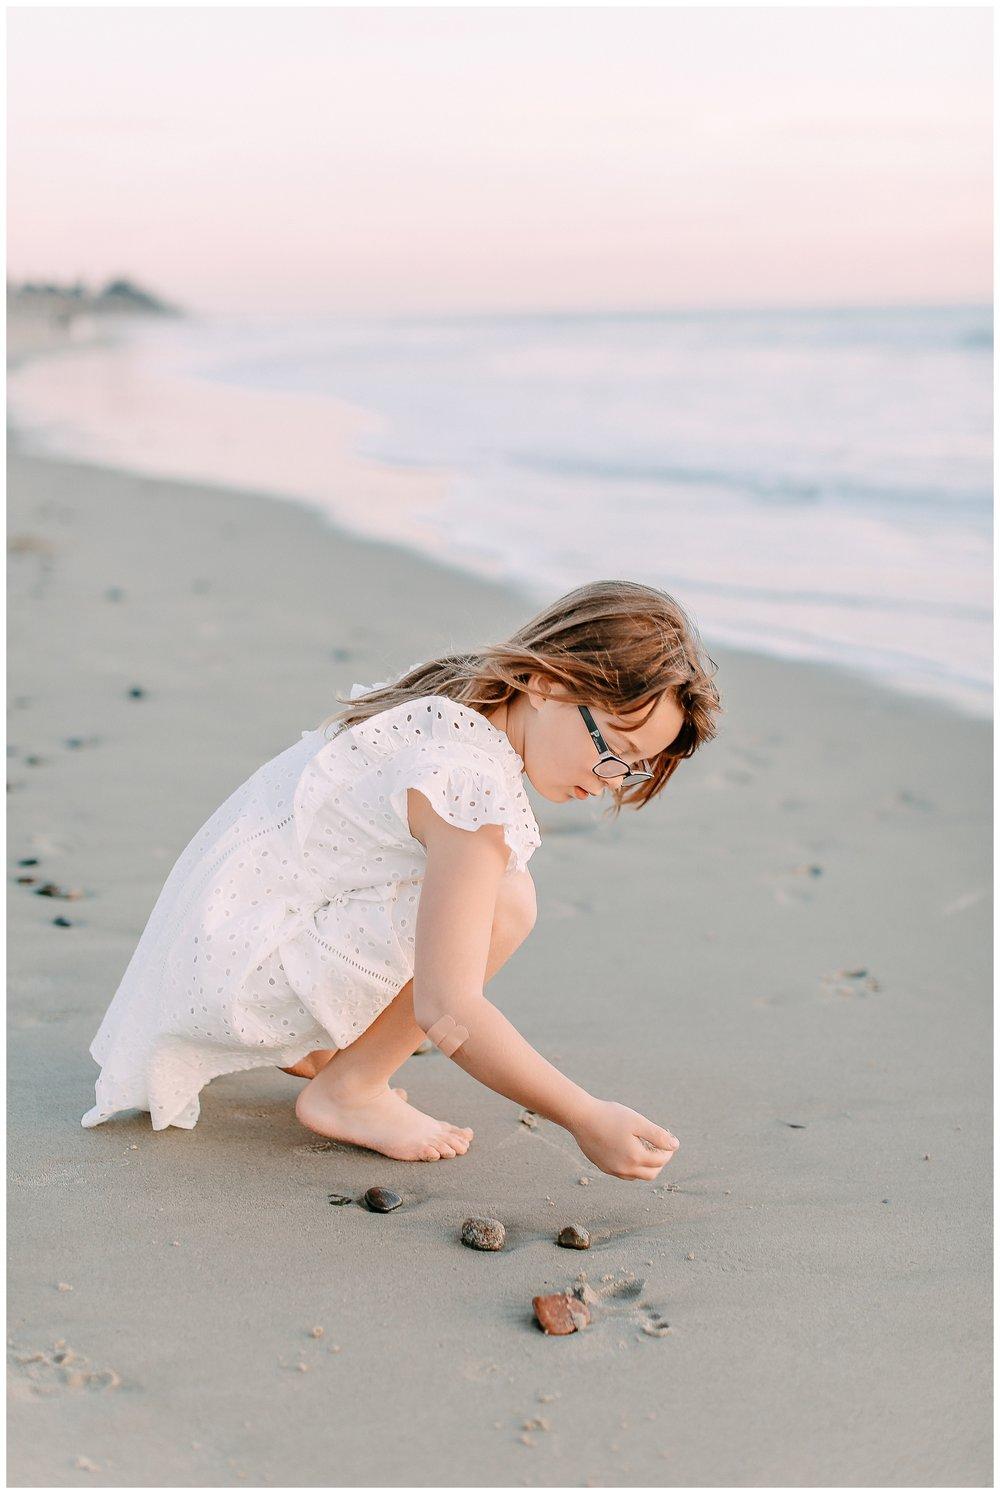 San_clemente_family_session_Orange_county_family_photographer_cori_kleckner_photography_laguna_beach_family_session_0709.jpg